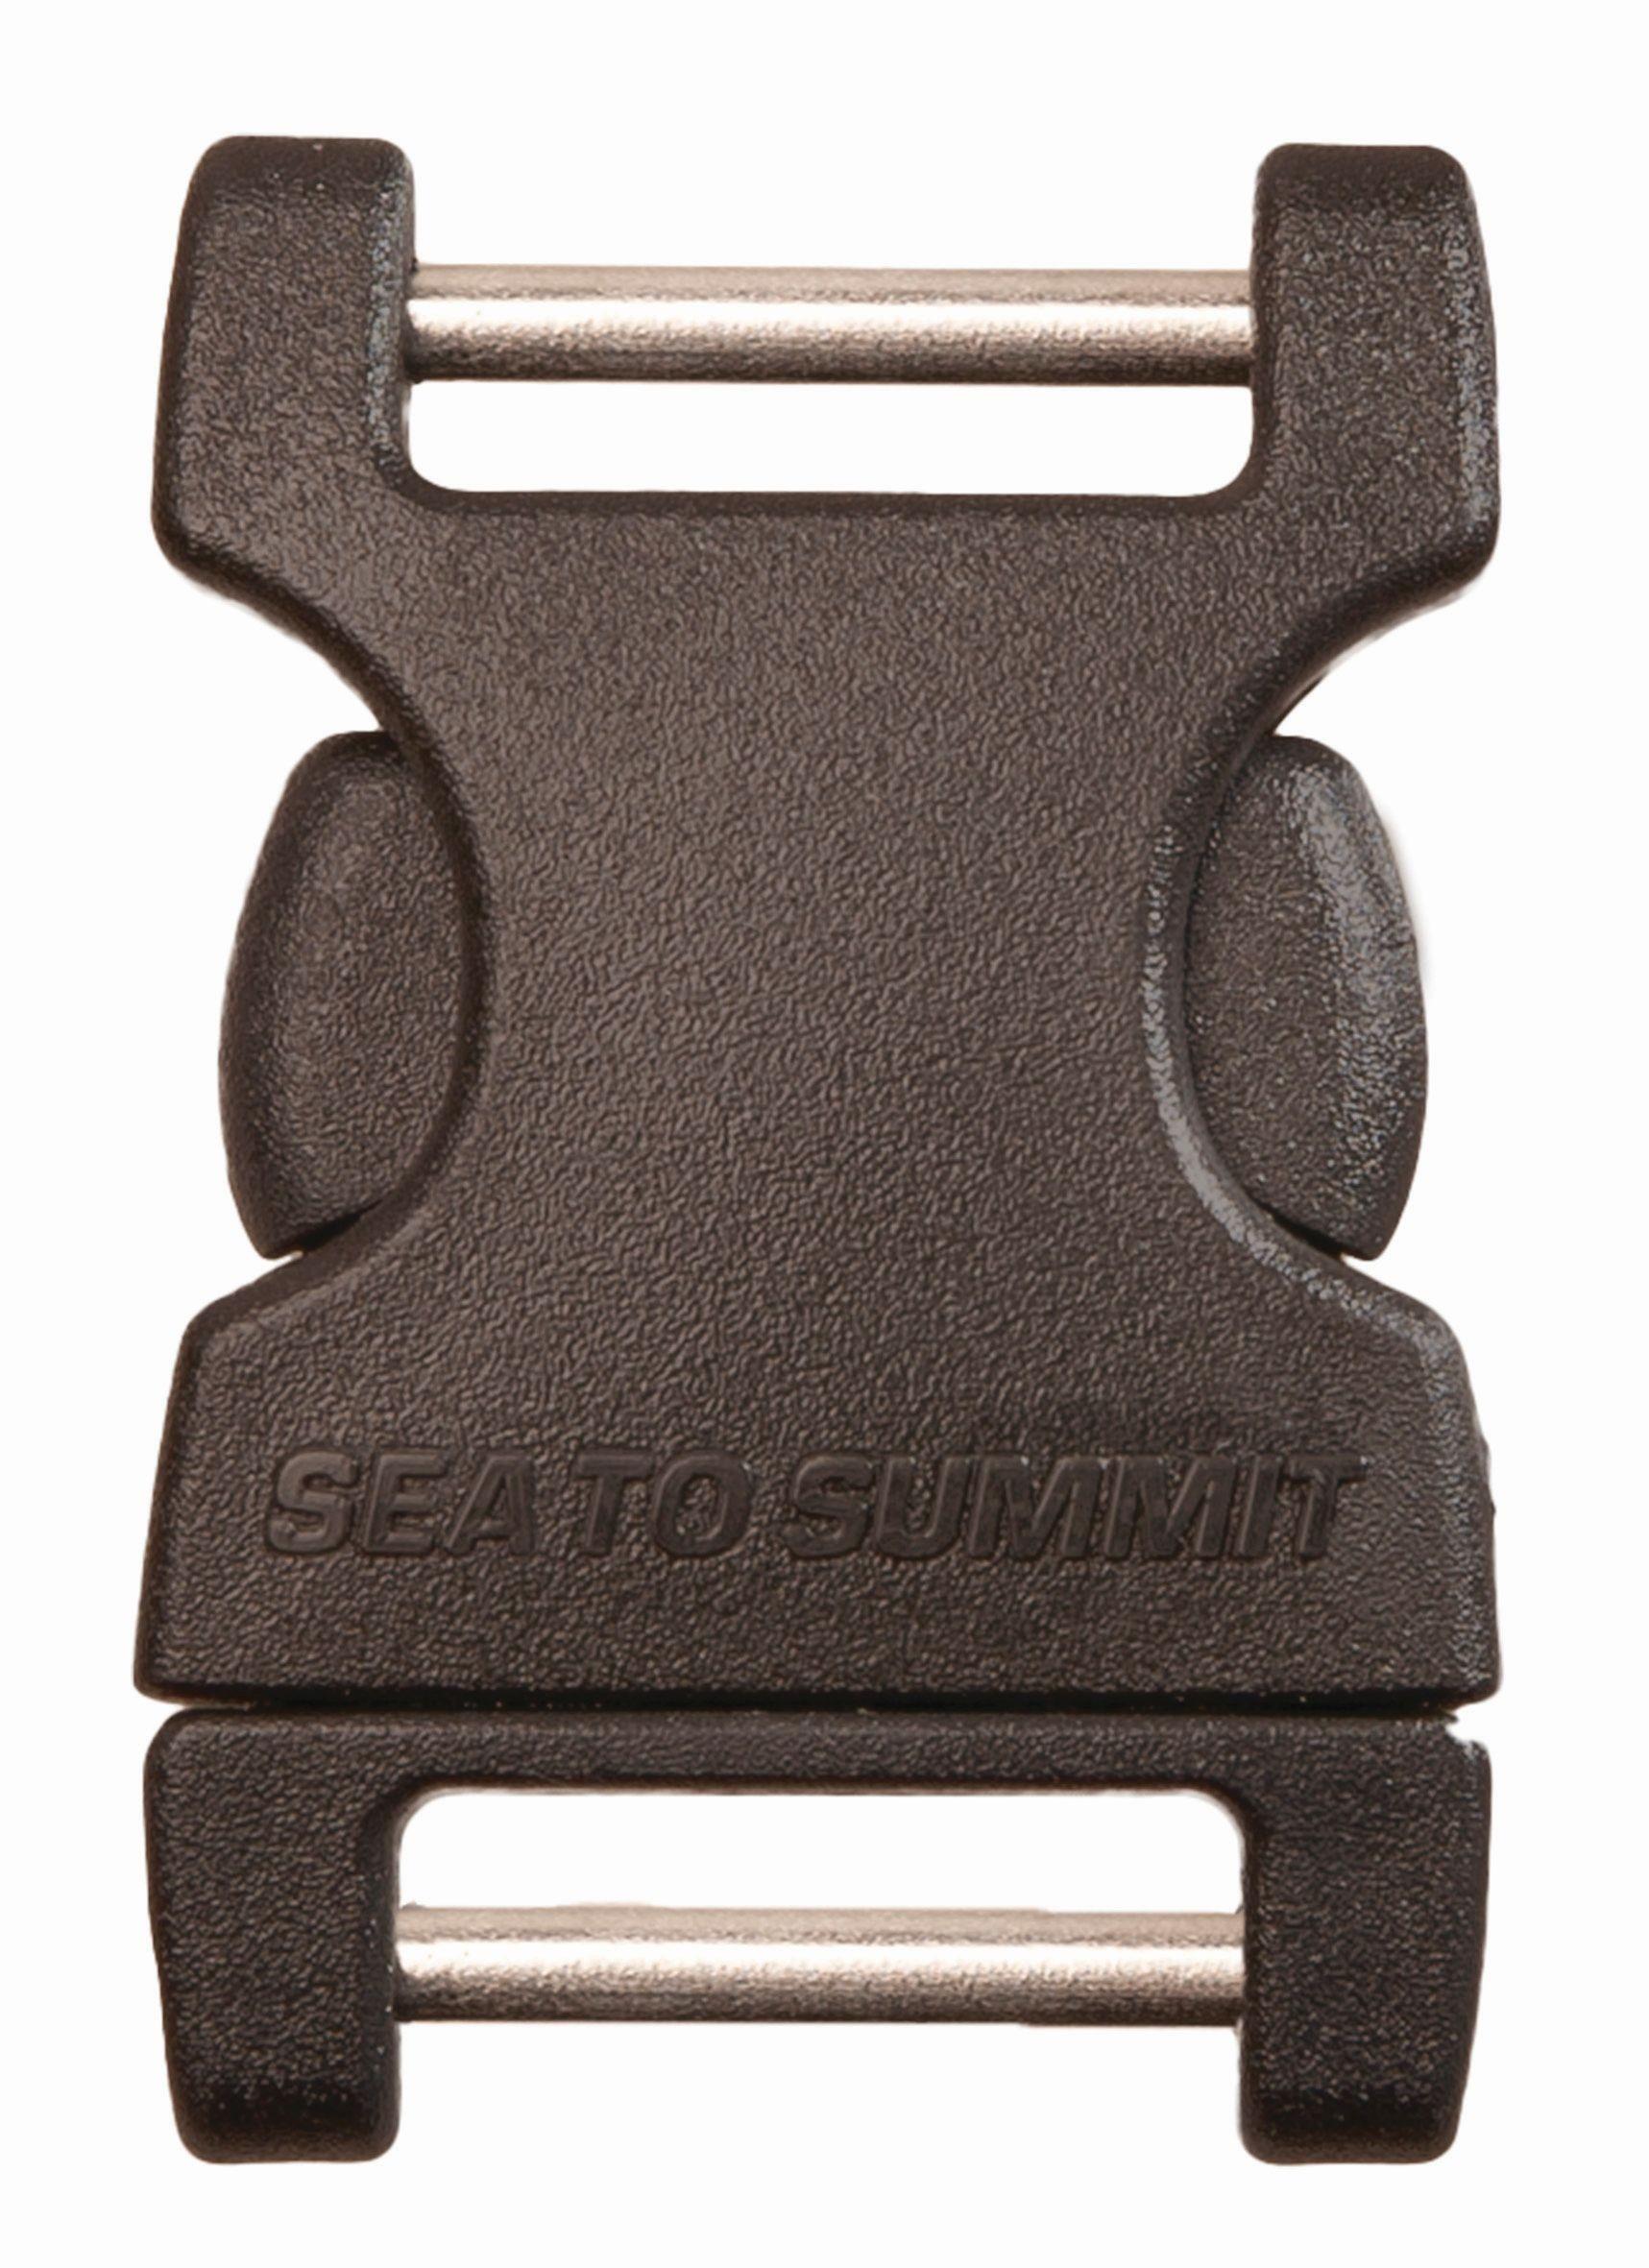 Sea To Summit Field Repair Buckle - 25mm Side Release 2 Pin